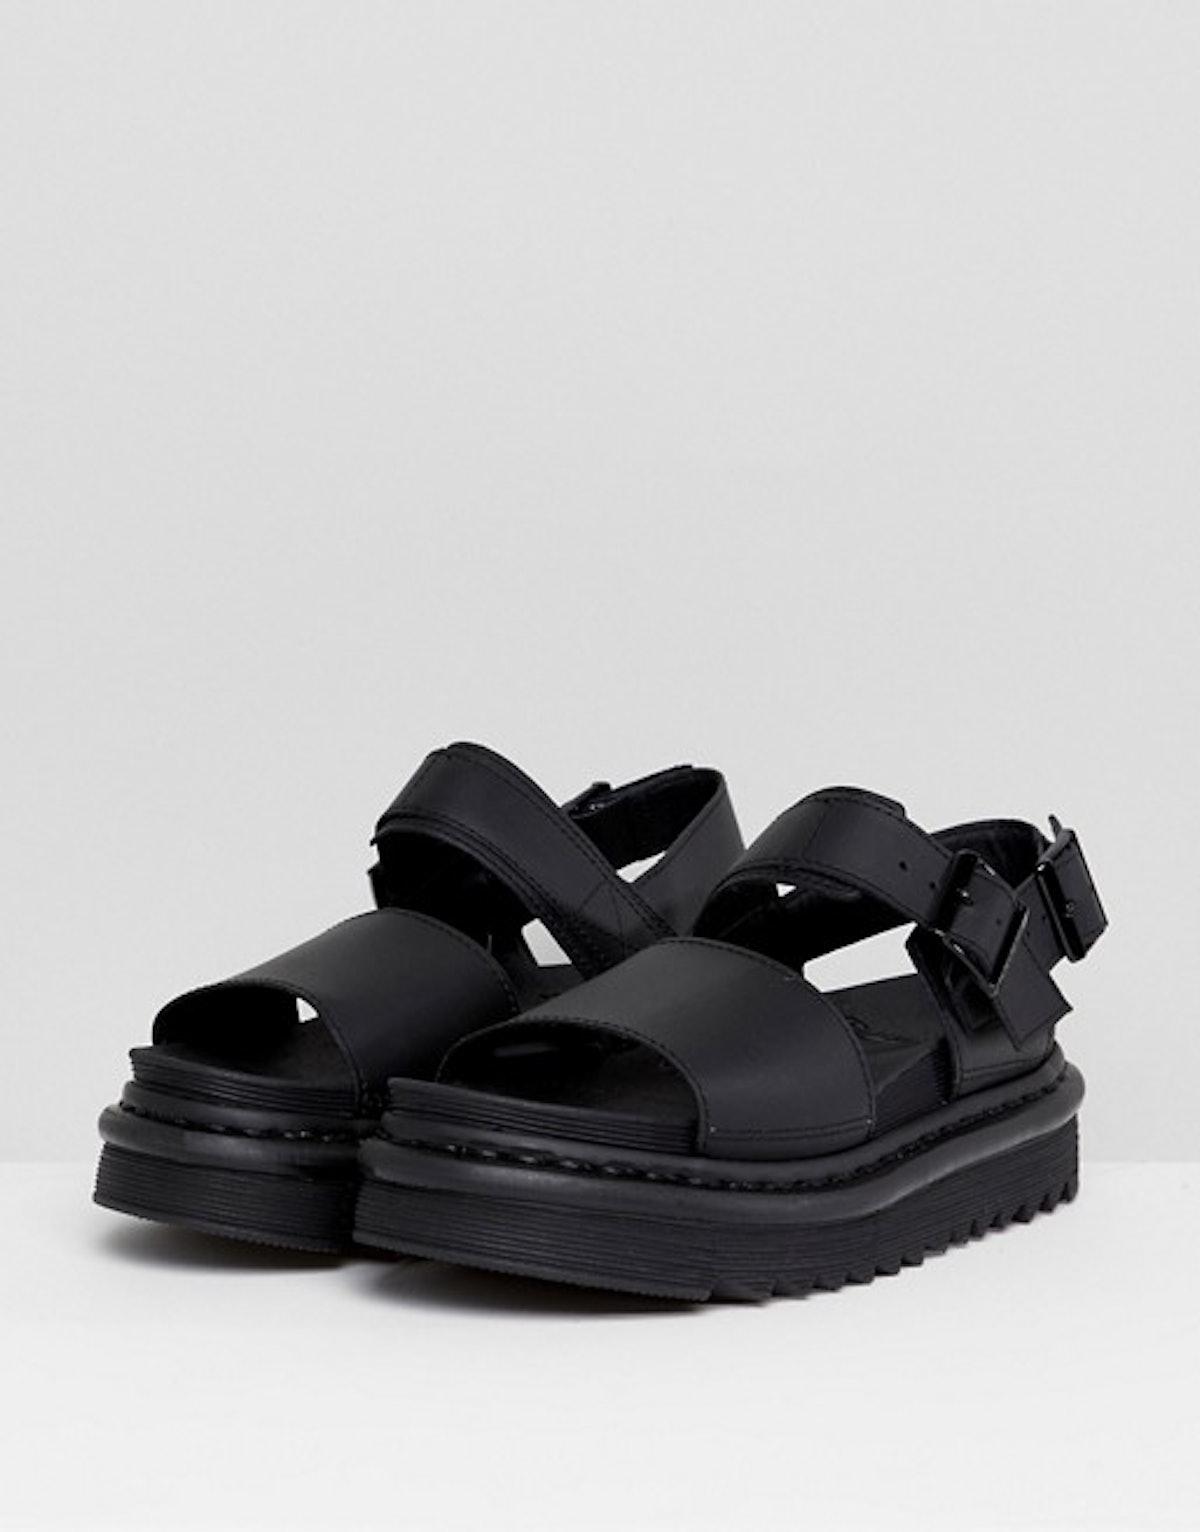 Dr Martens Voss Black Leather Flat Sandals